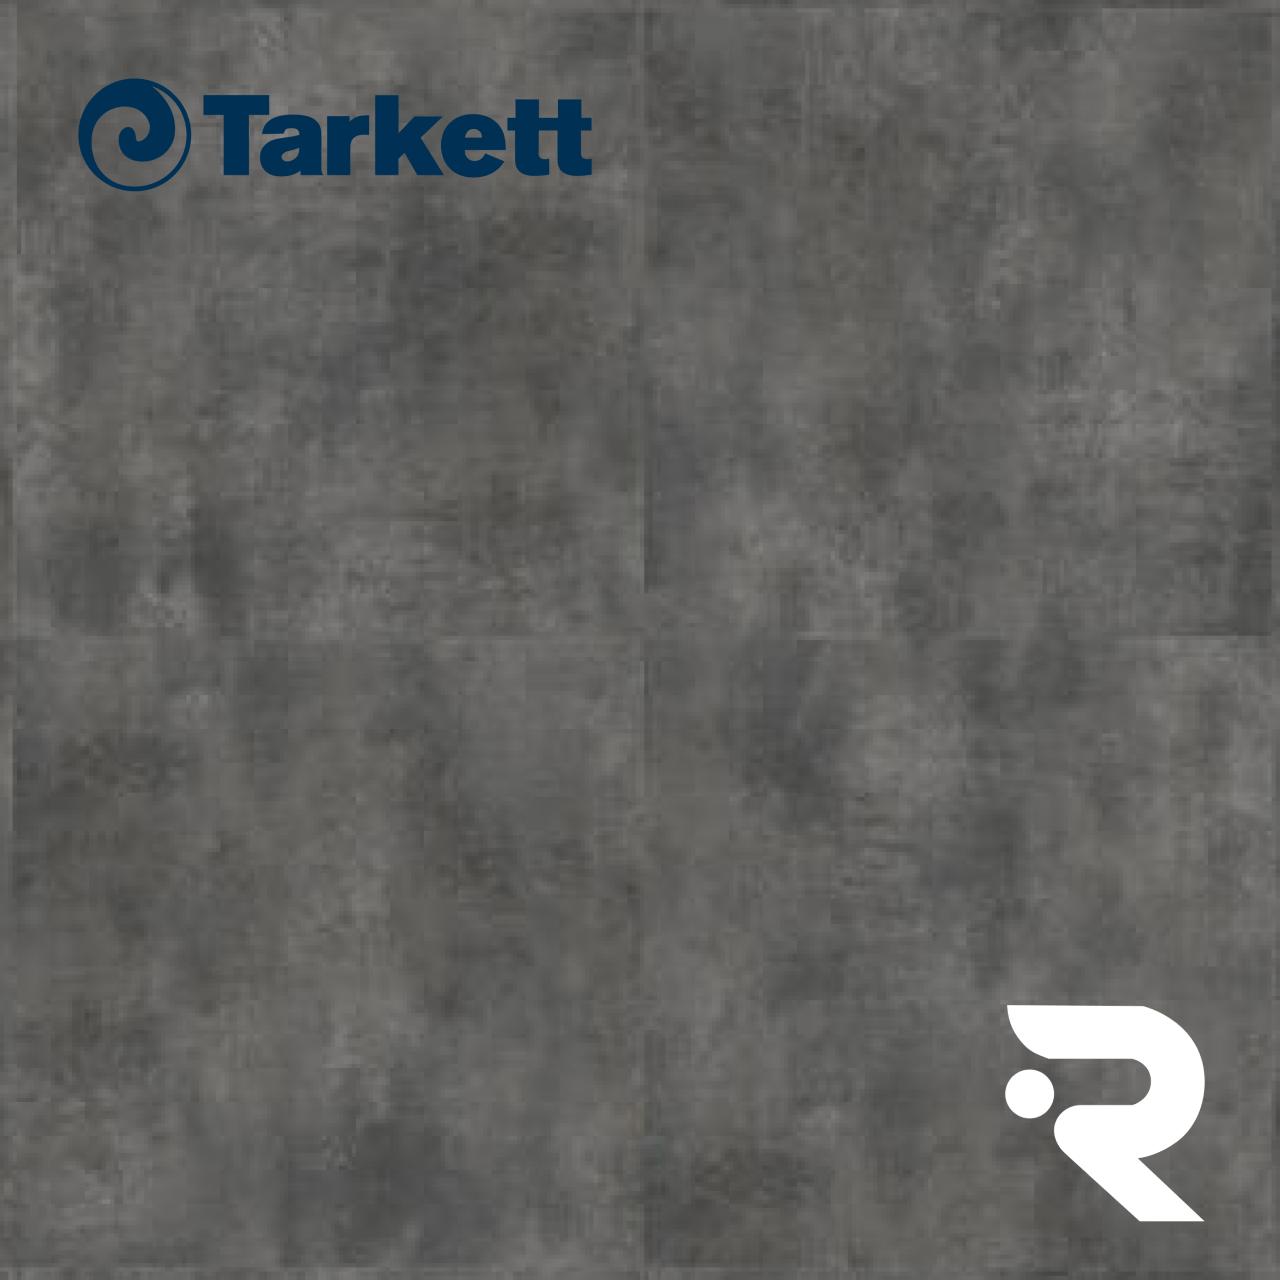 🌳 ПВХ плитка Tarkett | ModularT 7 - BETON DARK GREY | Art Vinyl | 600 x 600 мм